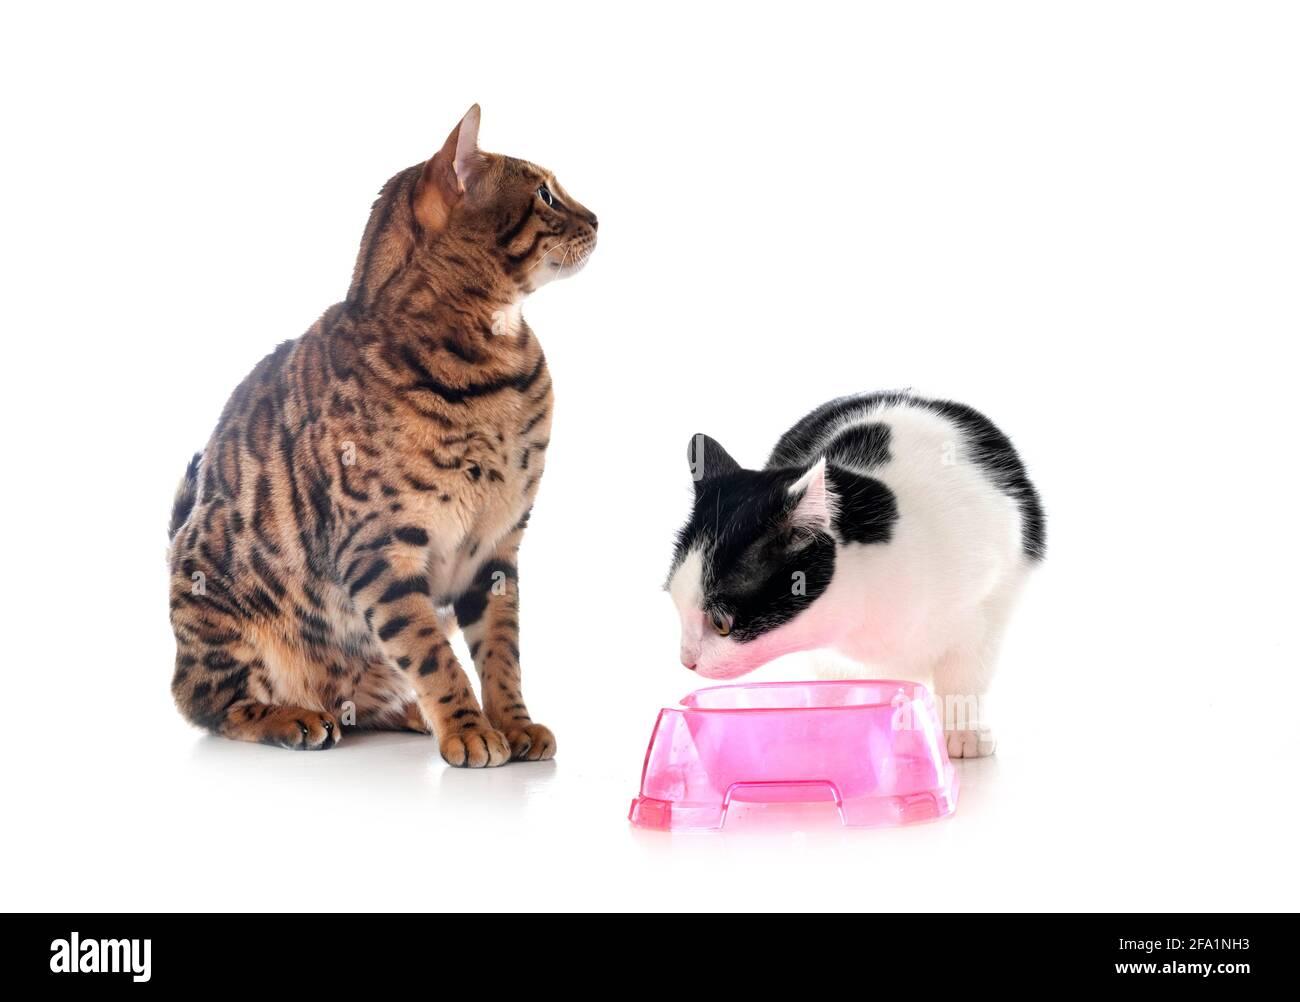 gato feral y gato bengal delante de fondo blanco Foto de stock